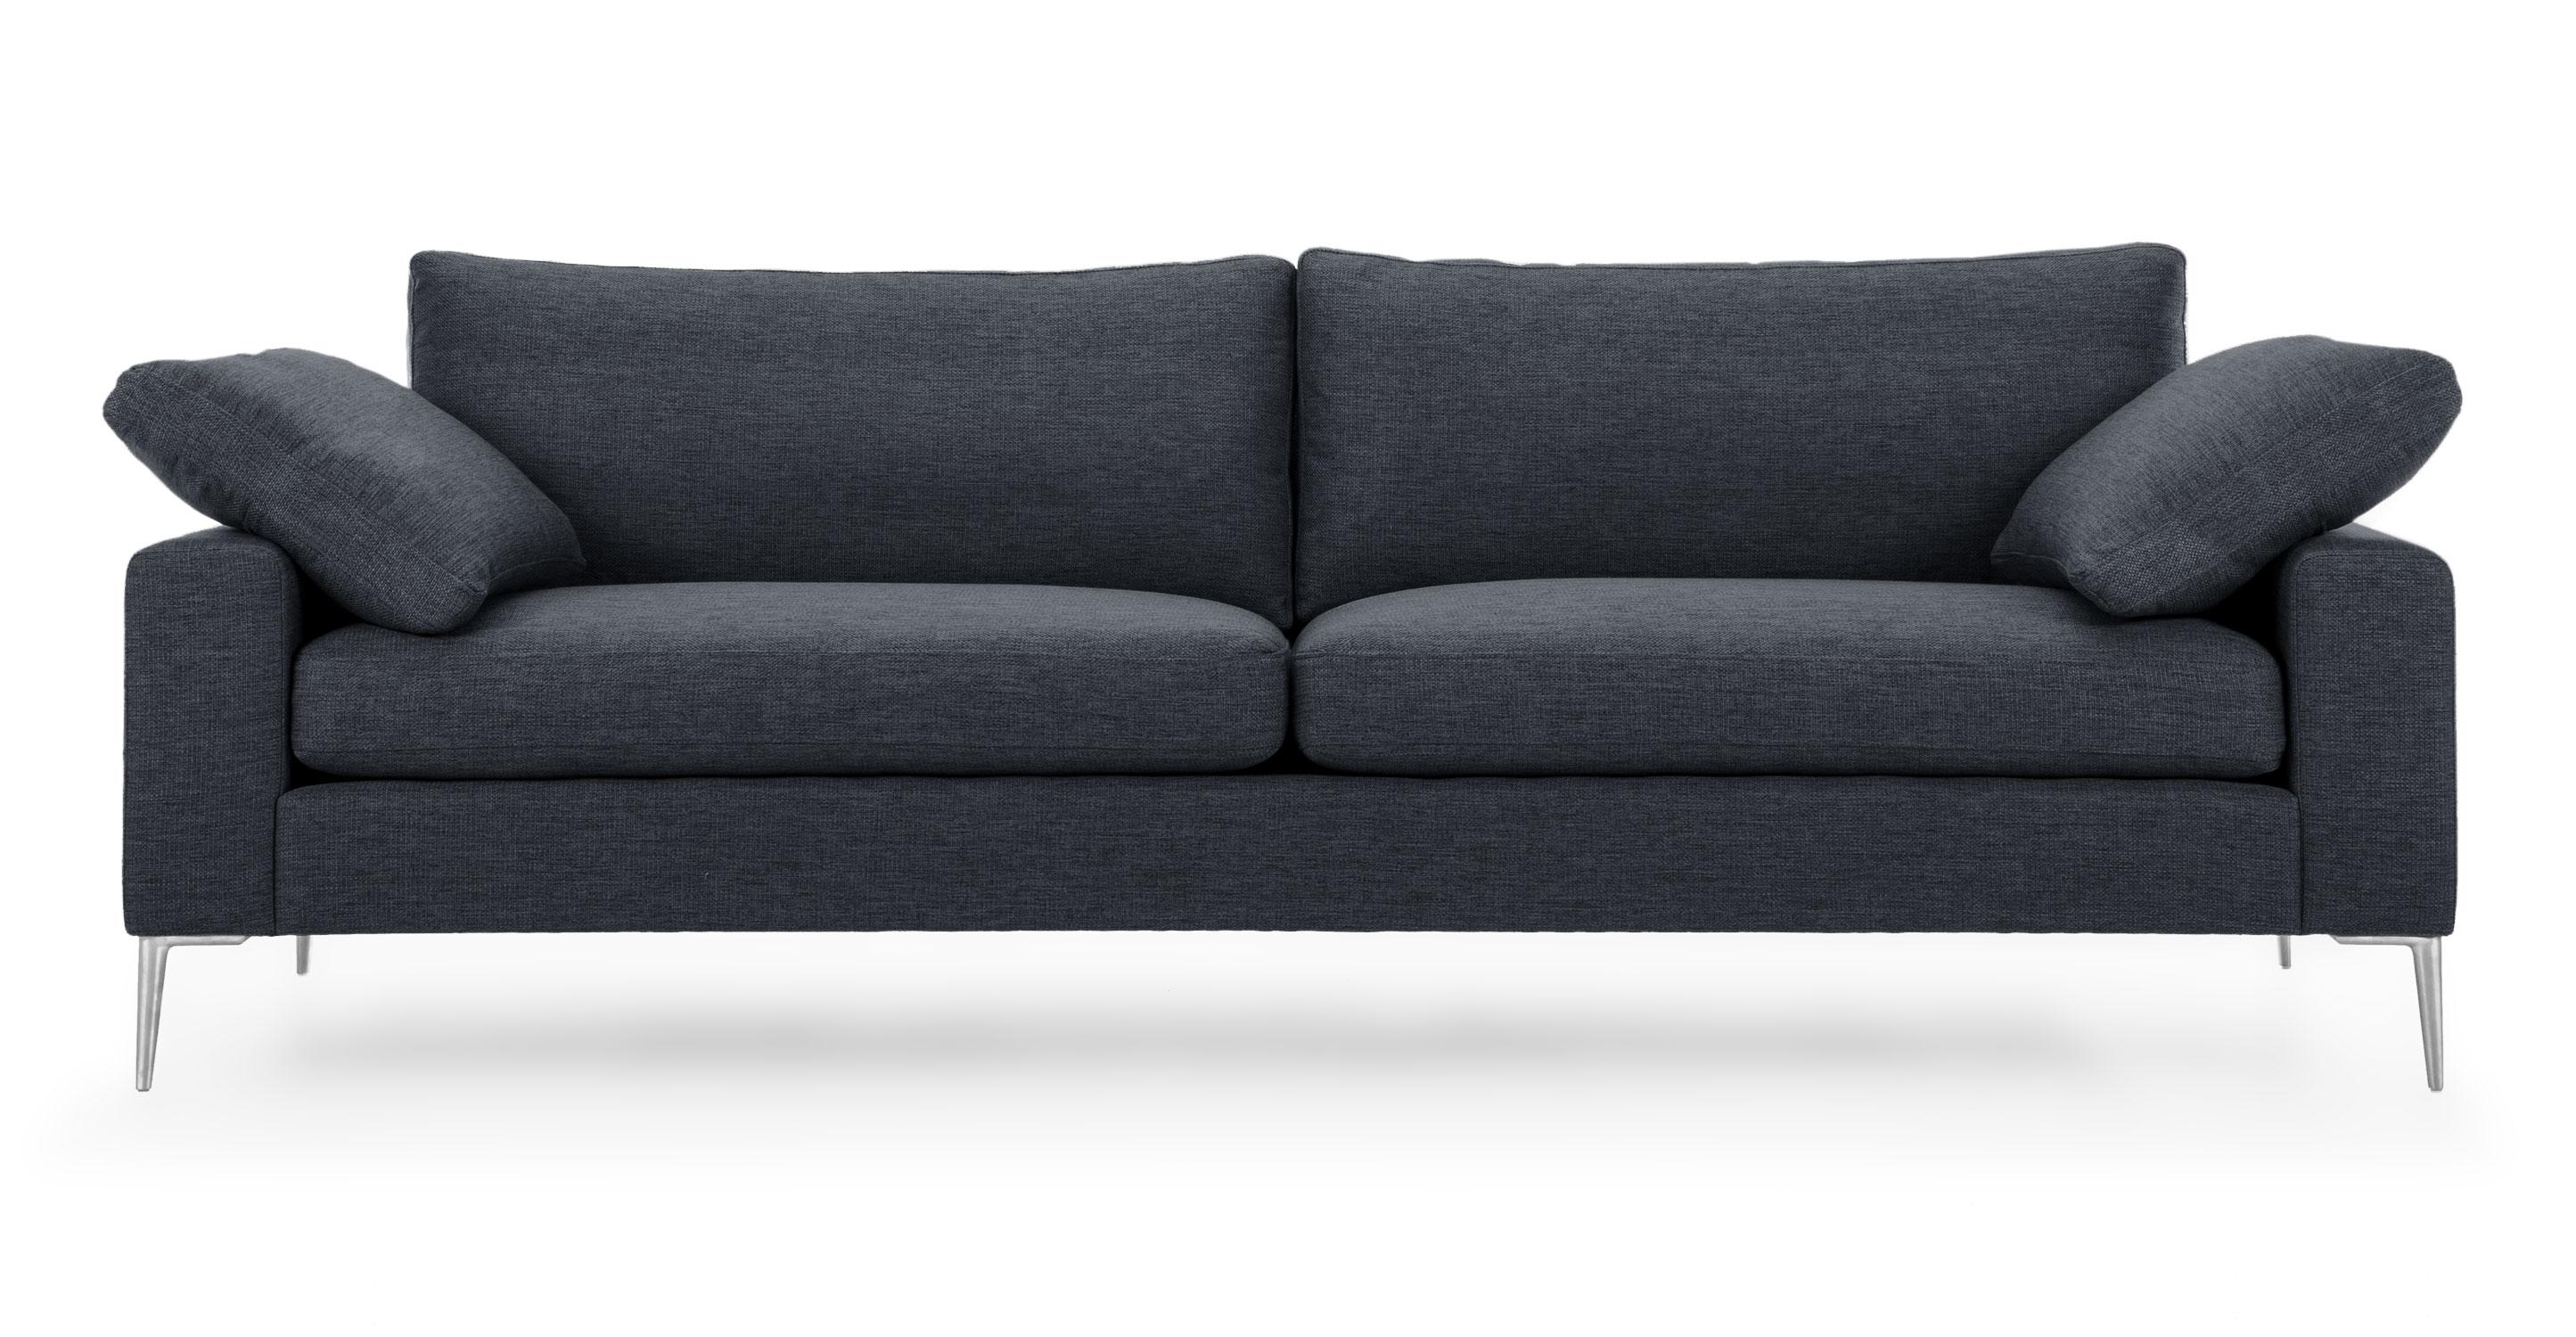 phantom contemporary grey leather sectional sofa w ottoman loose covers nova bard gray metal legs sofas article modern